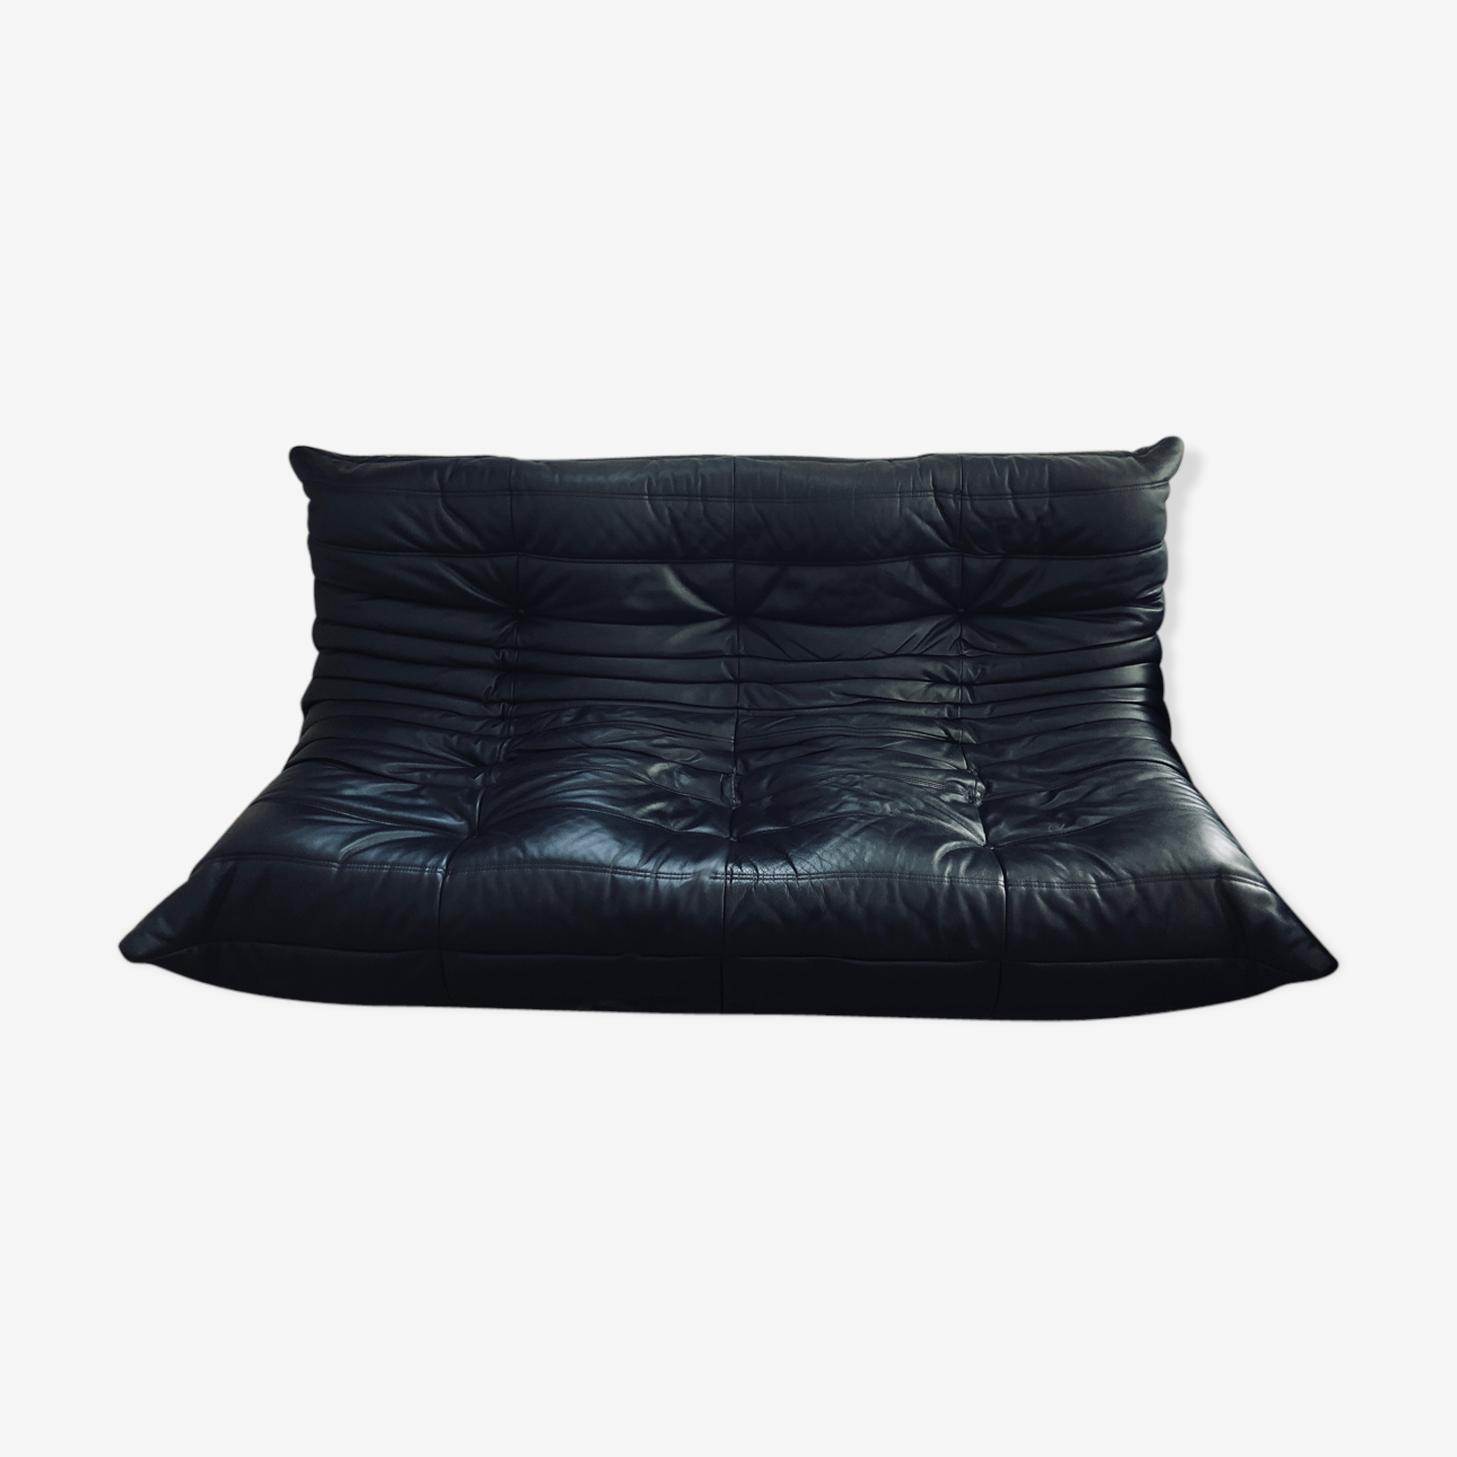 Togo cuir noir par Michel Ducaroy Ligne Roset